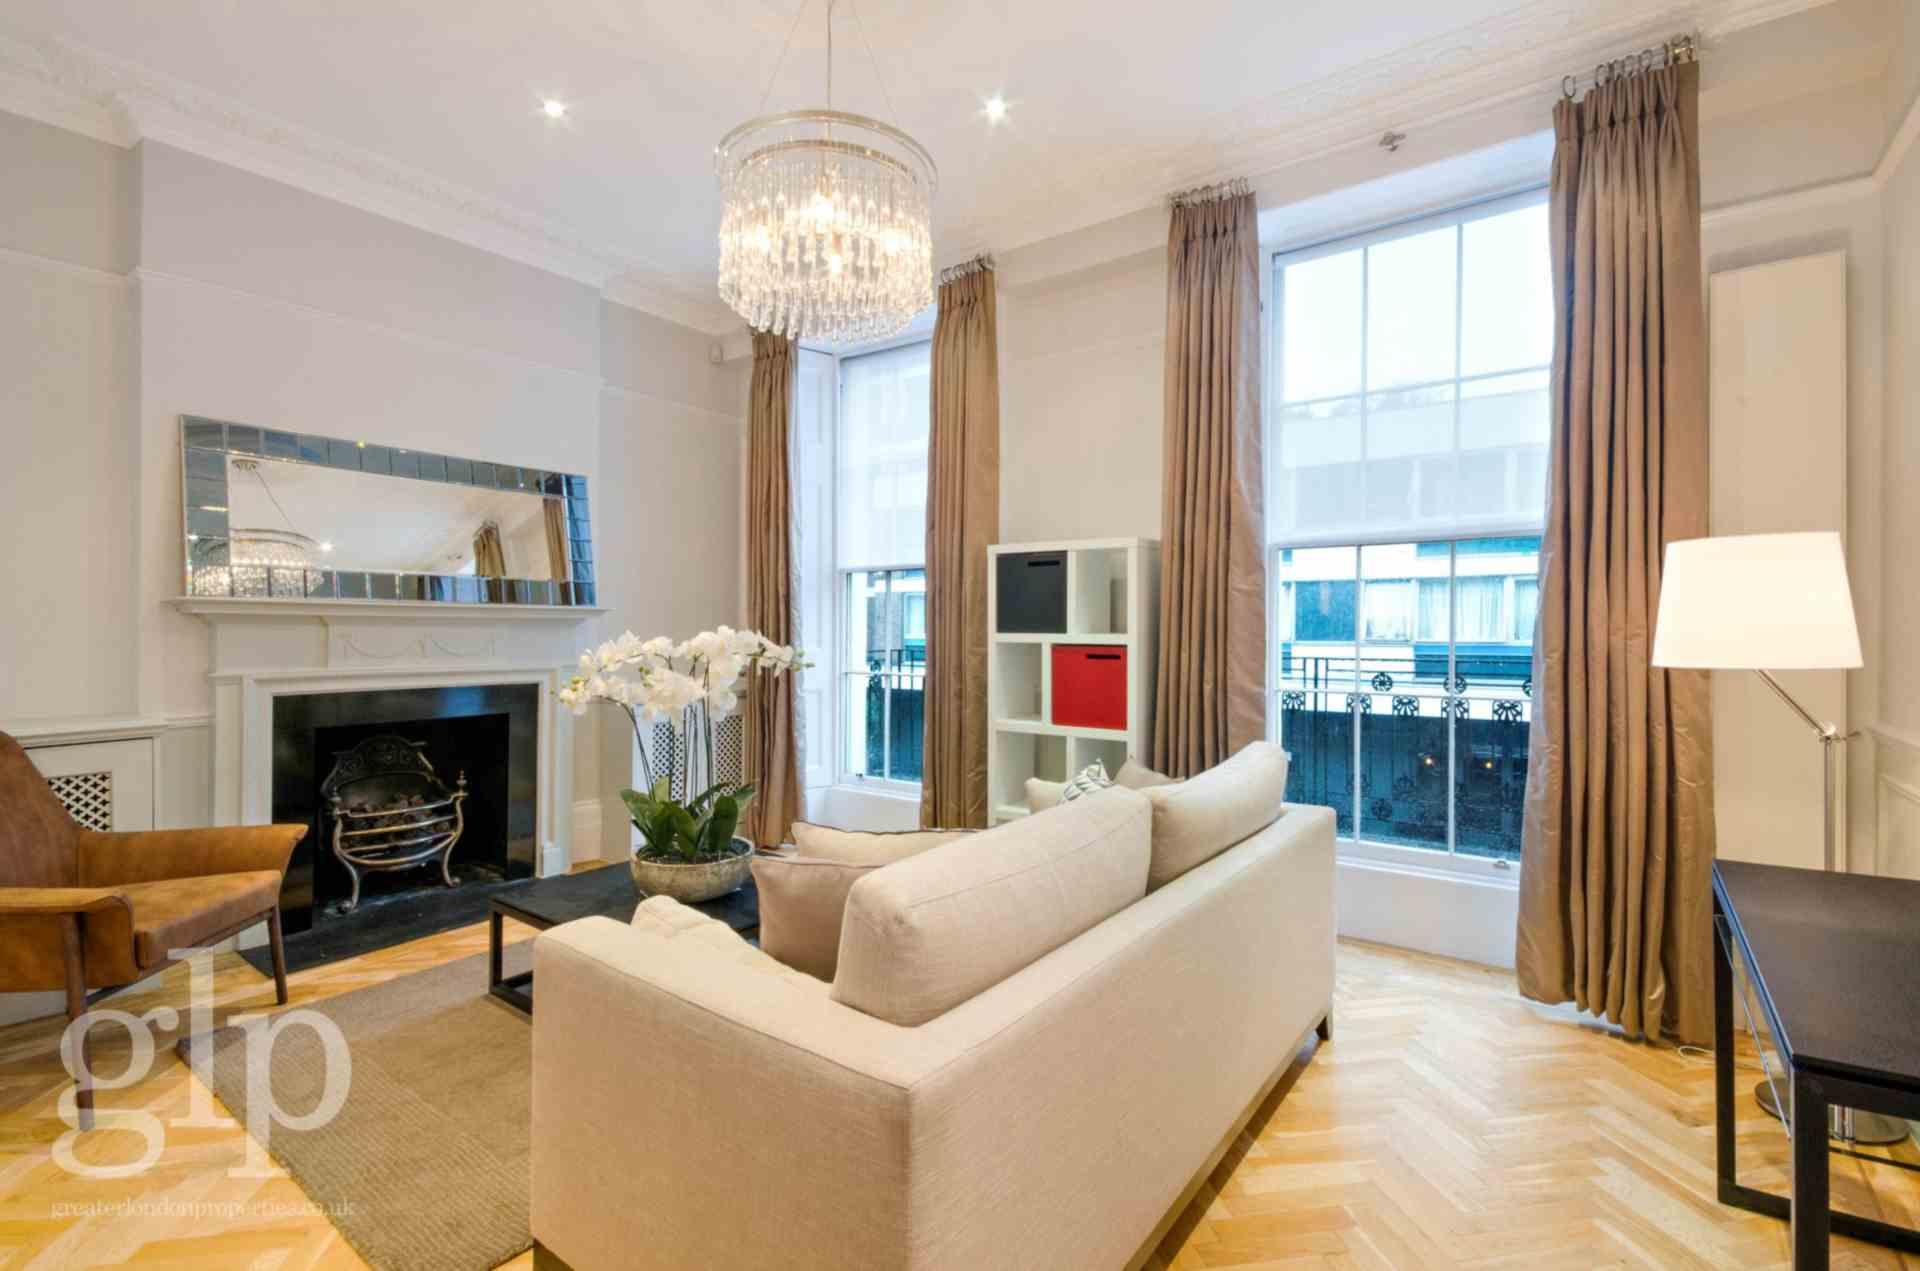 6897 1, Greater London Properties